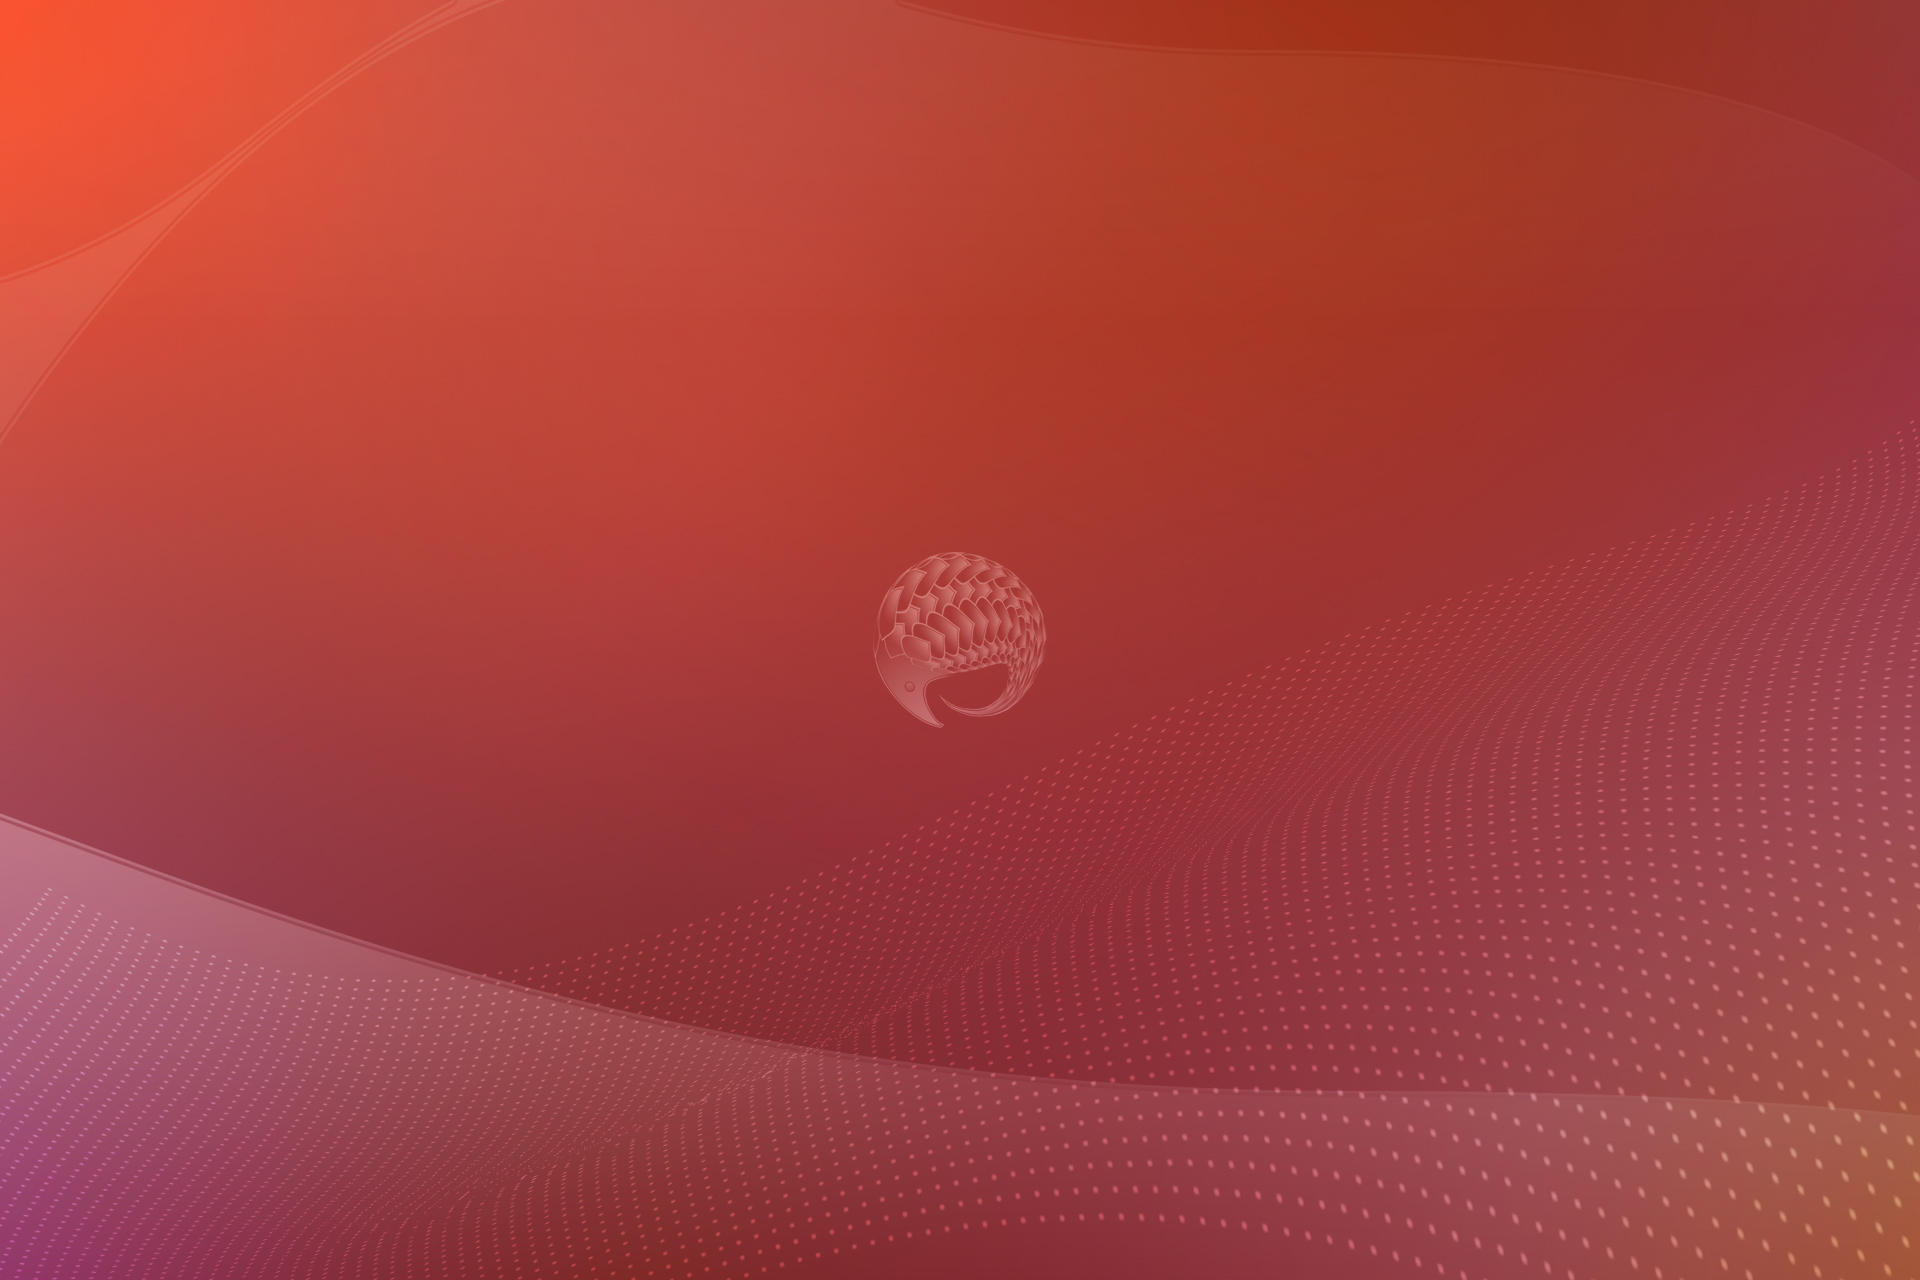 ubuntu precise pangolin wallpaper - photo #5